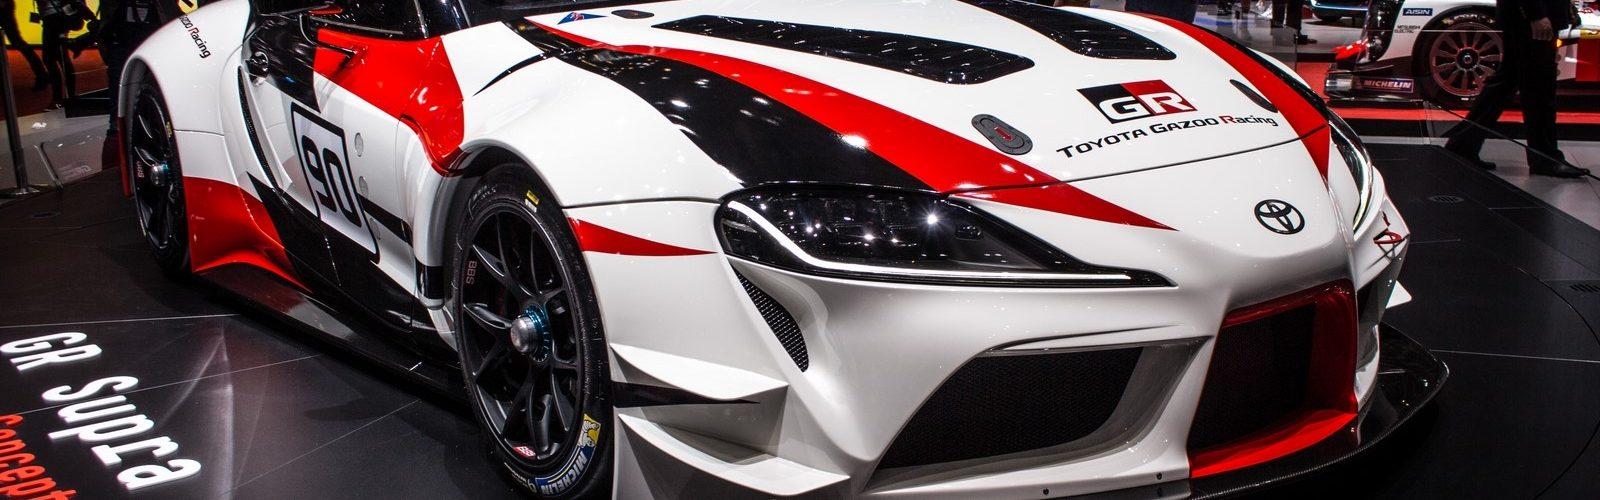 Geneve 2018 Toyota LeNouvelAutomobiliste 08